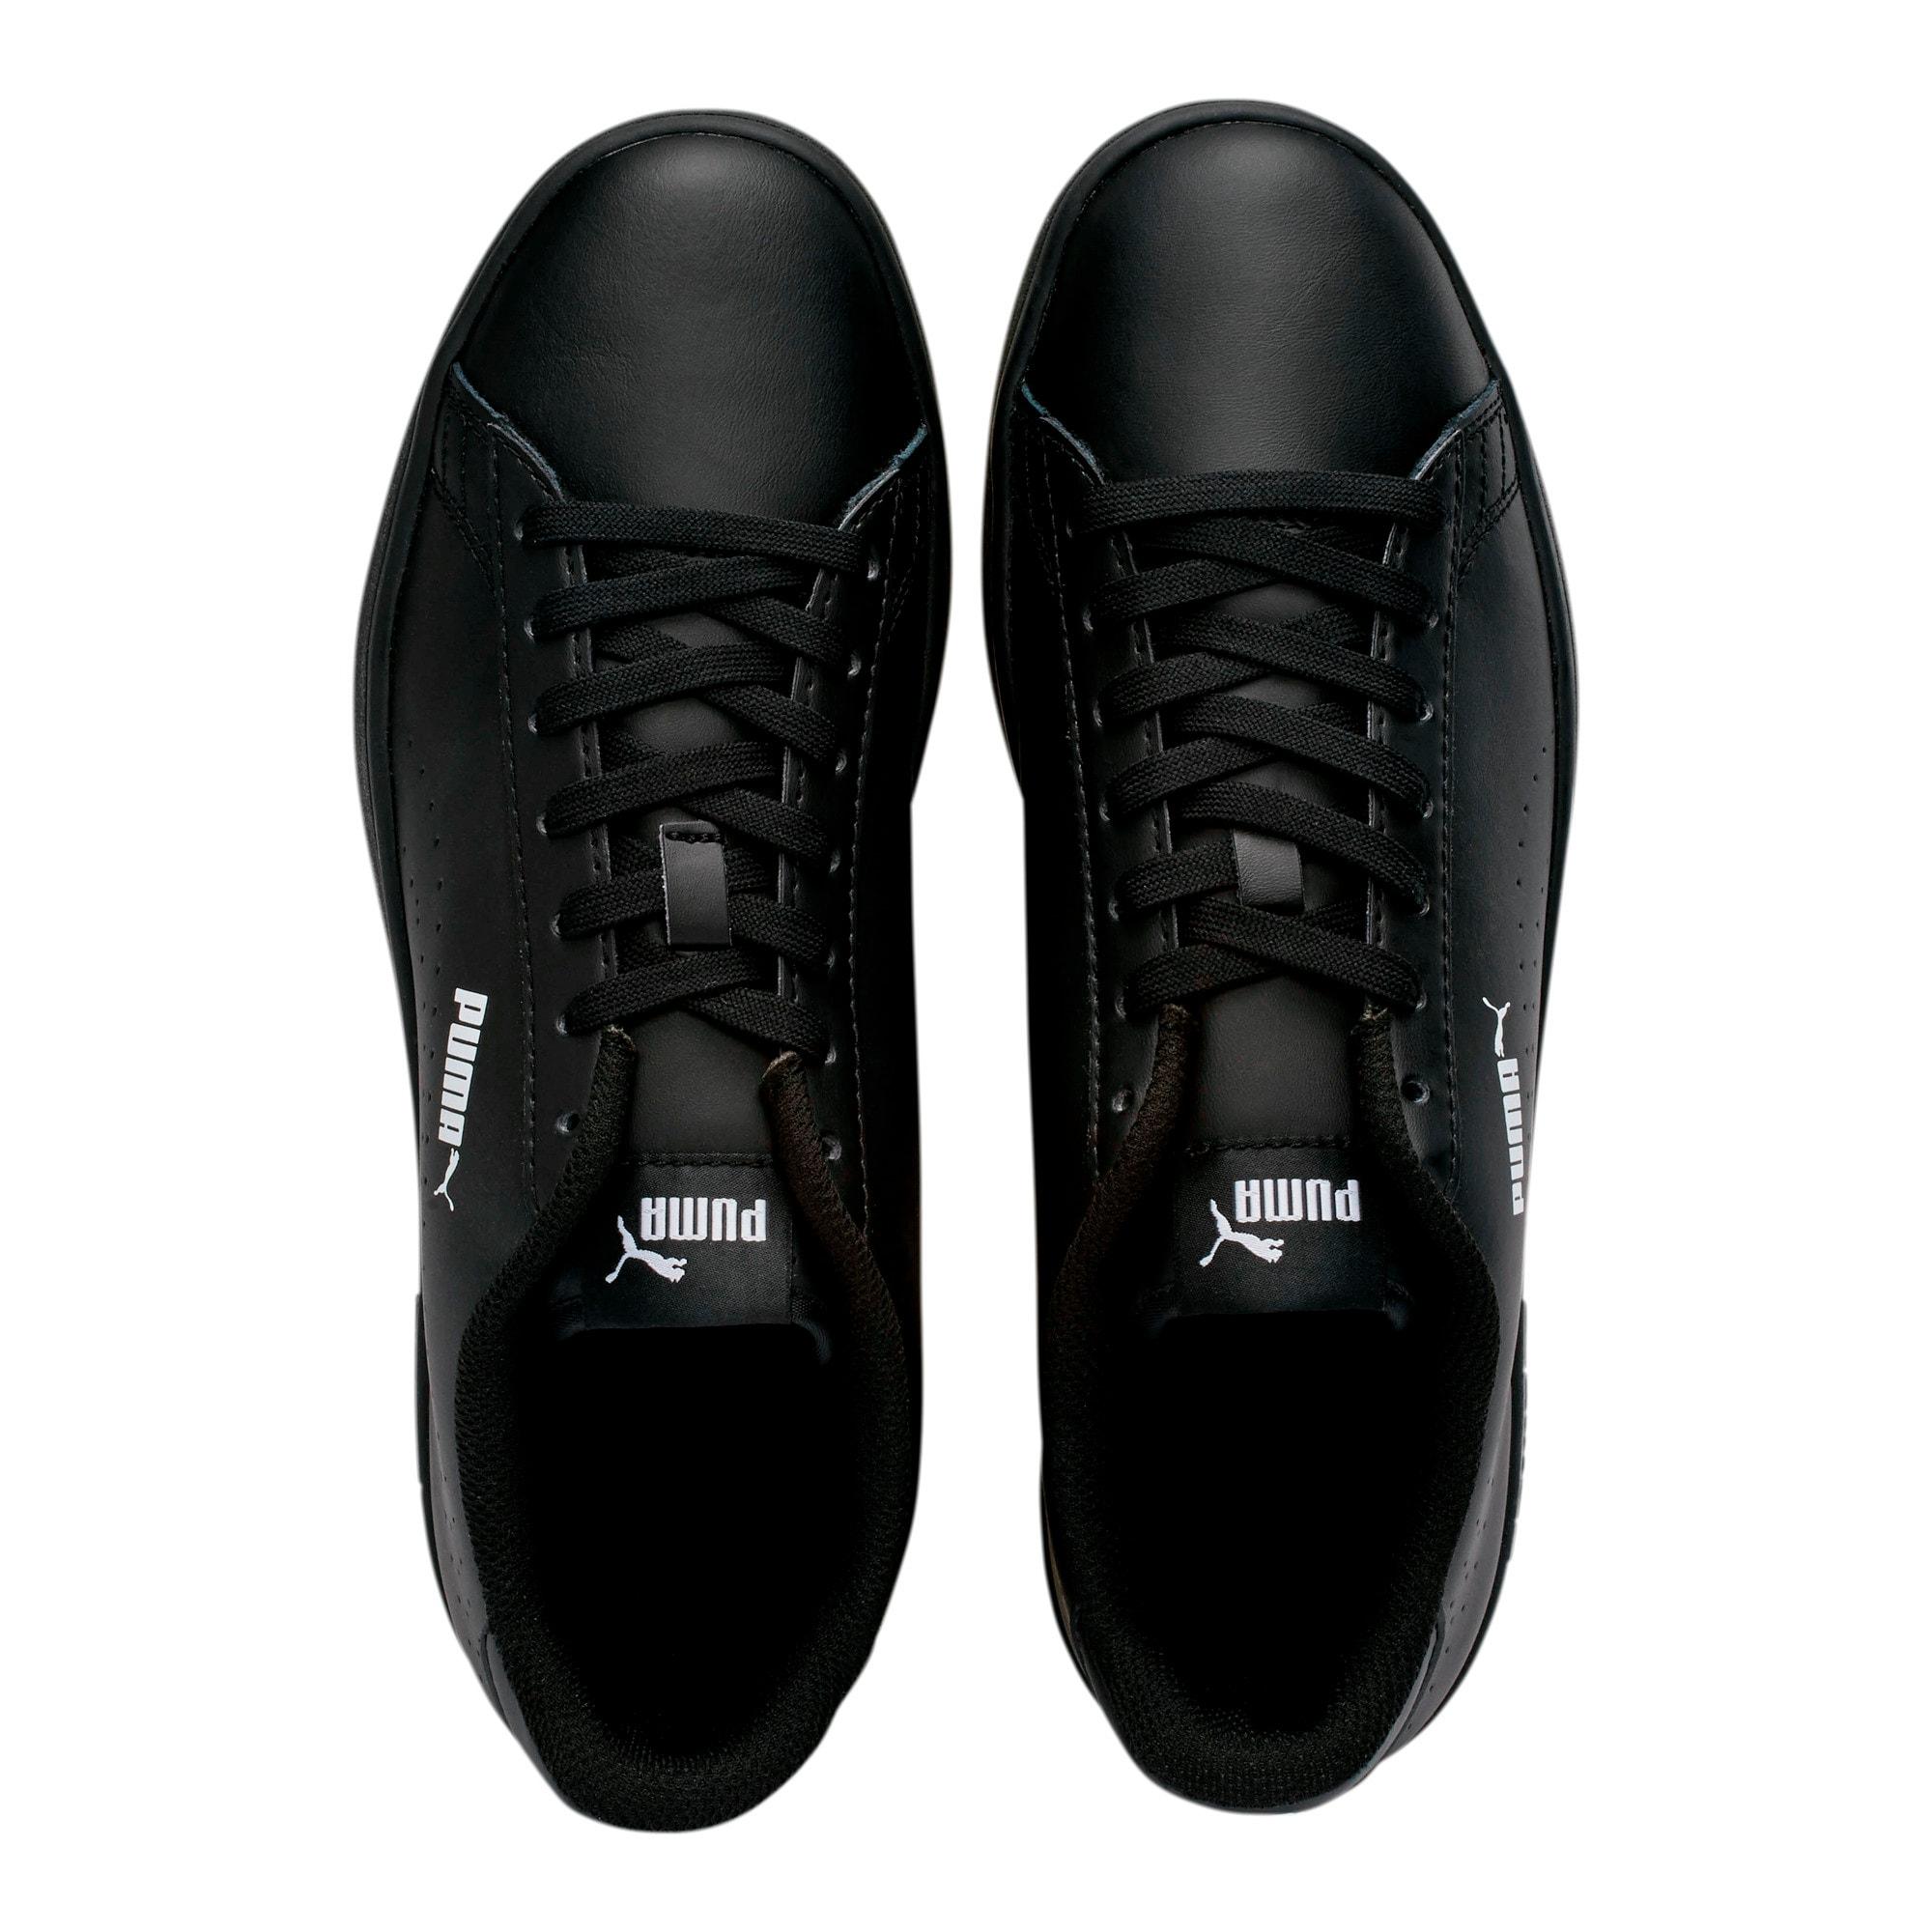 Thumbnail 6 of PUMA Smash v2 Leather Perf Sneakers, Puma Black-Puma Black, medium